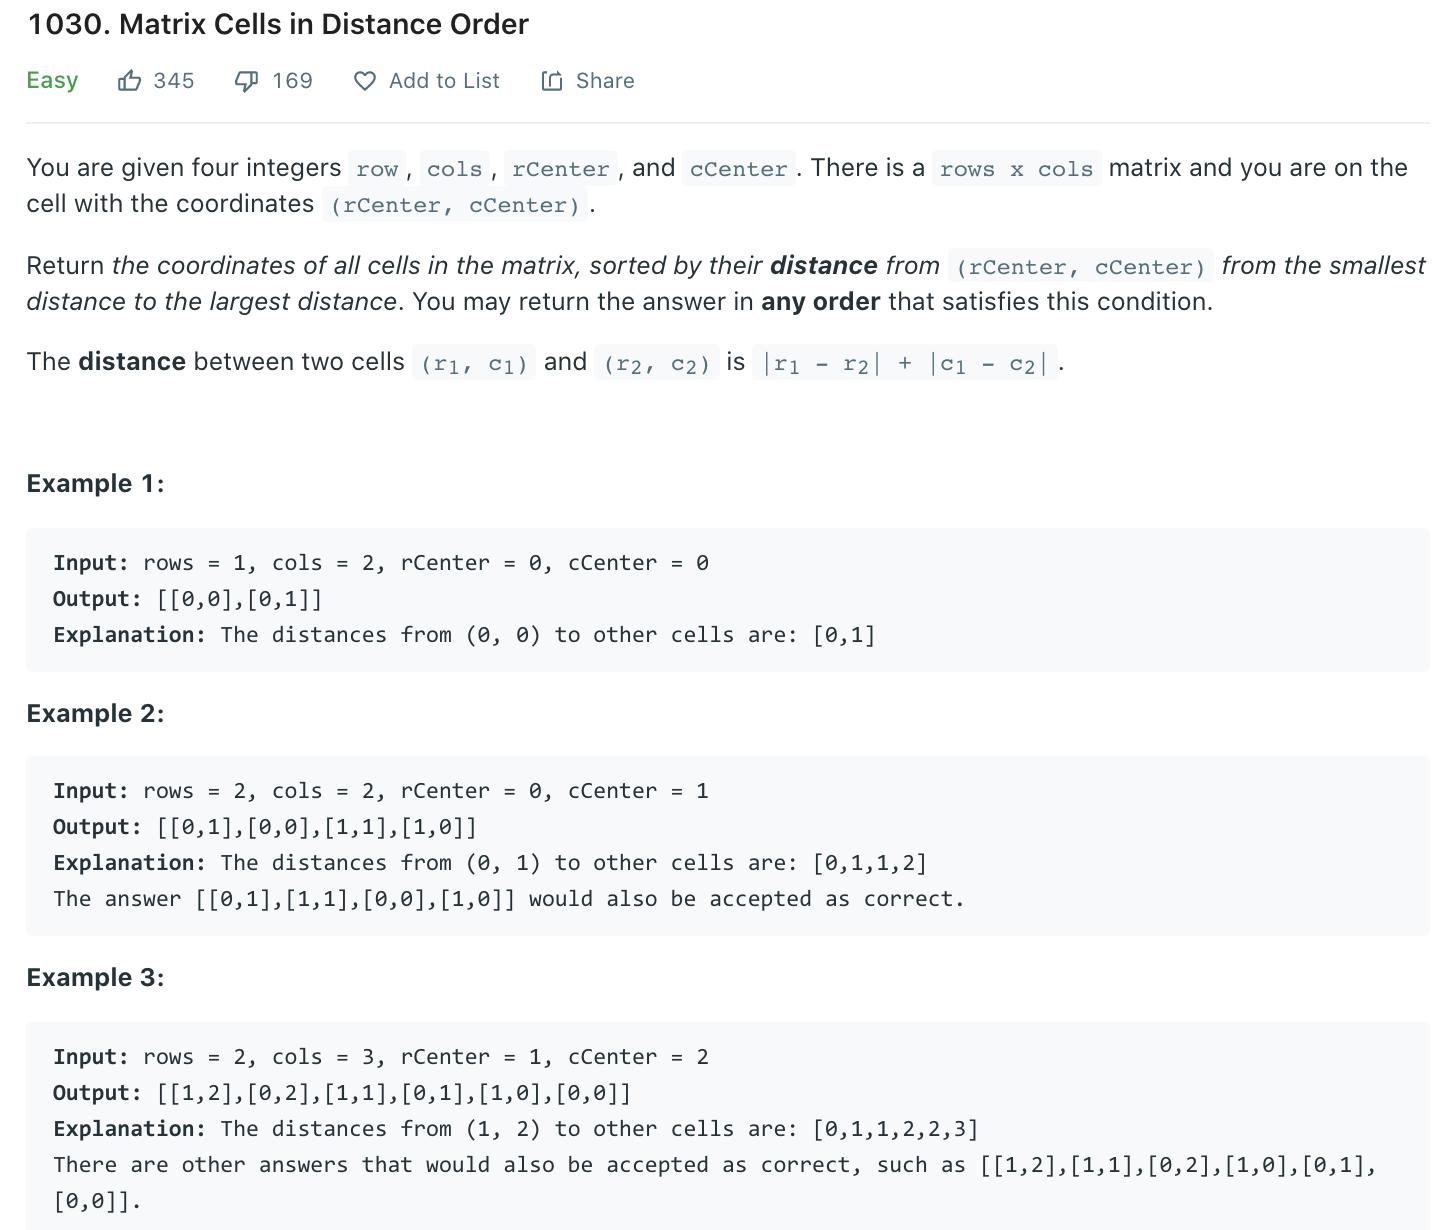 Matrix Cells in Distance Order